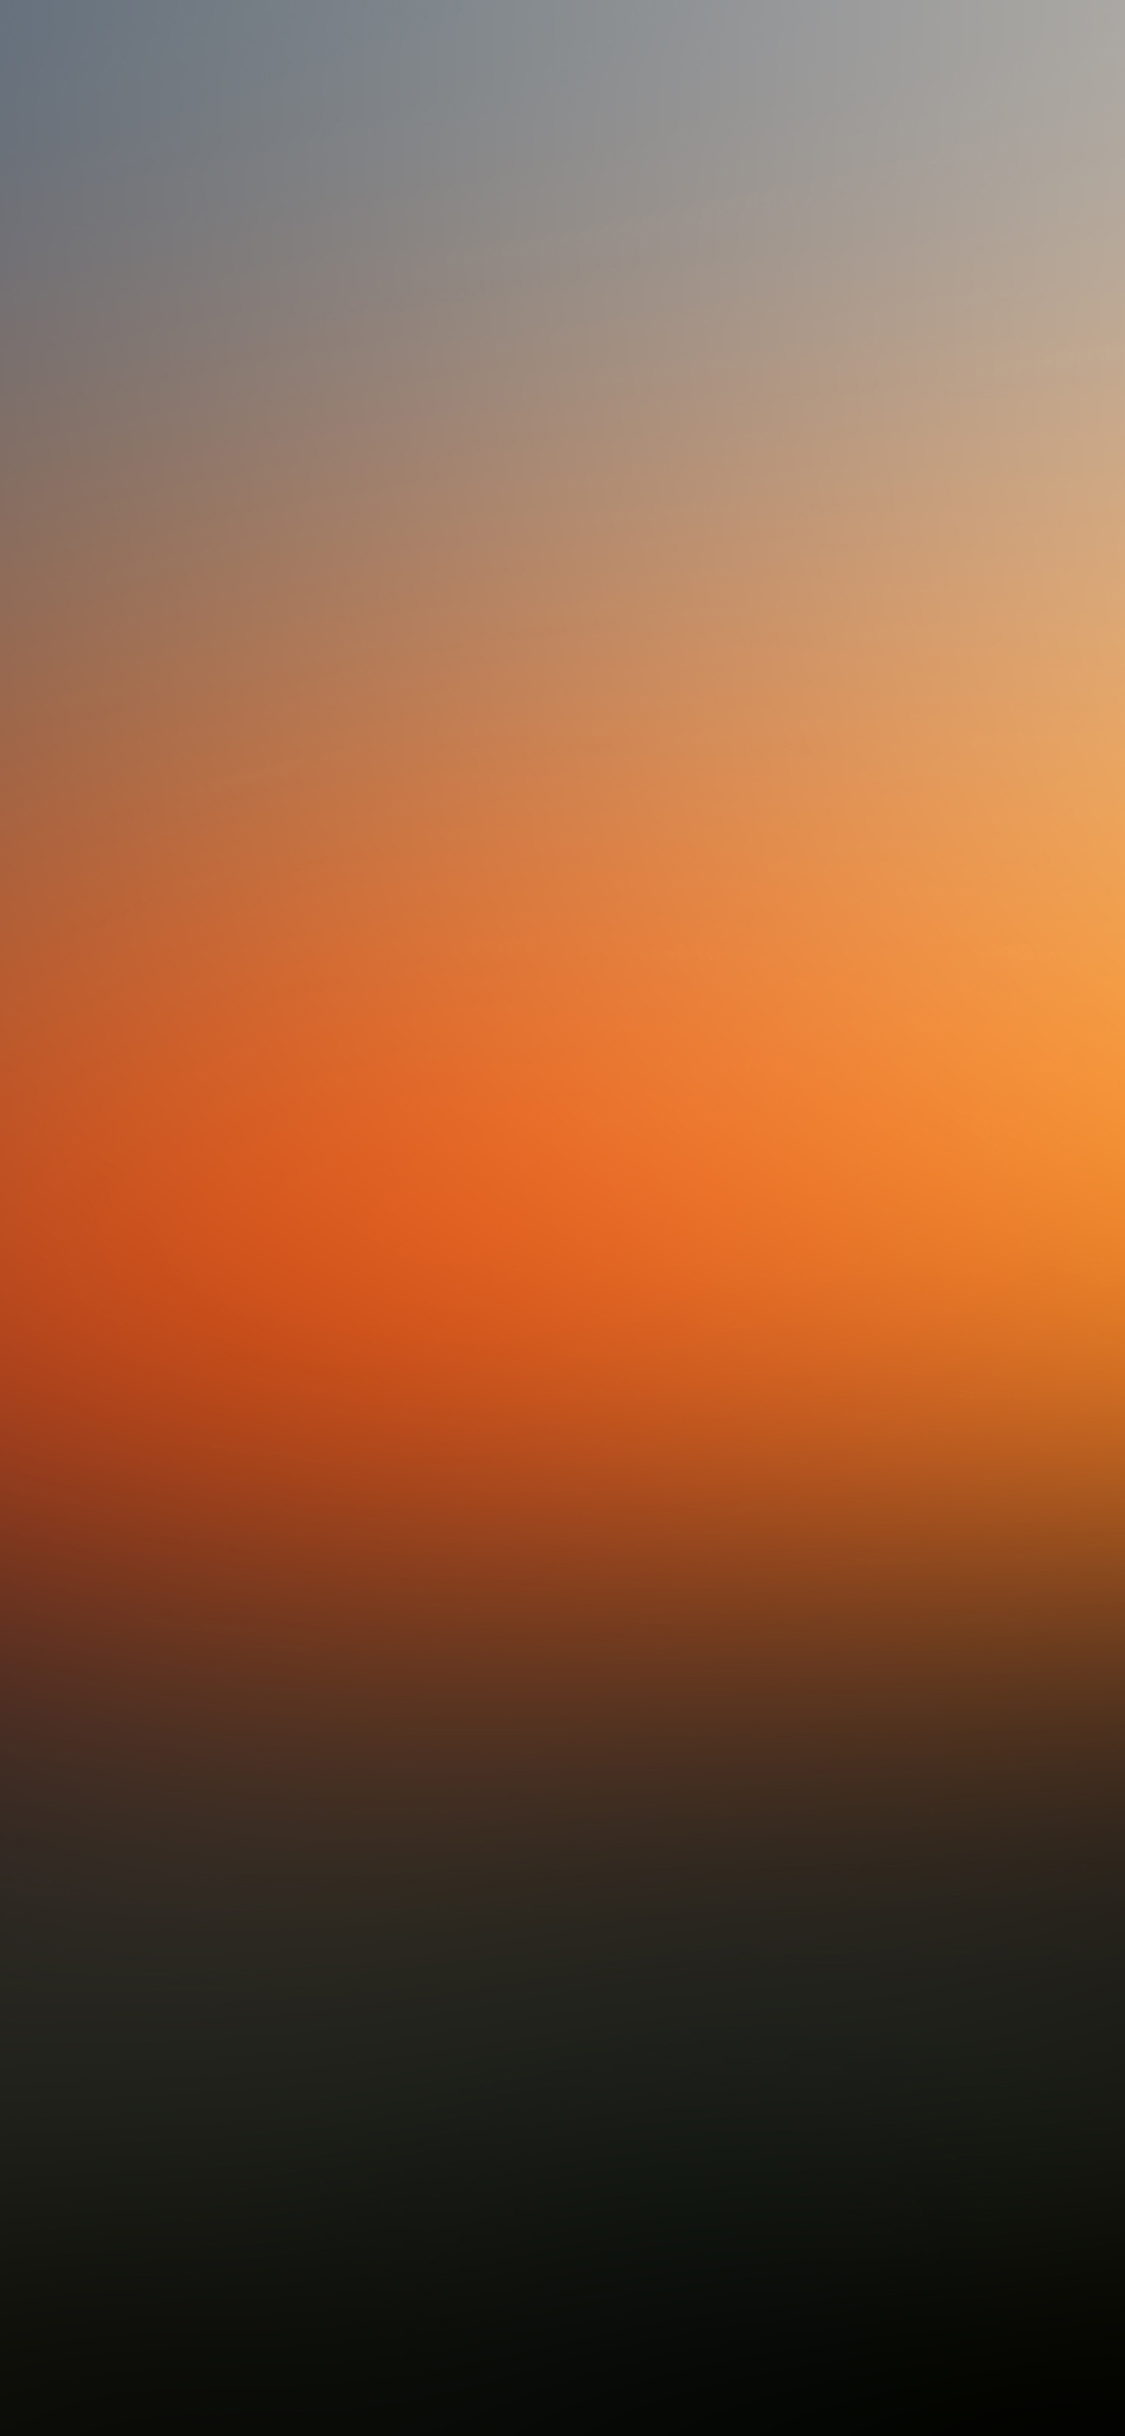 iPhoneXpapers.com-Apple-iPhone-wallpaper-sb40-wallpaper-busan-night-city-blur